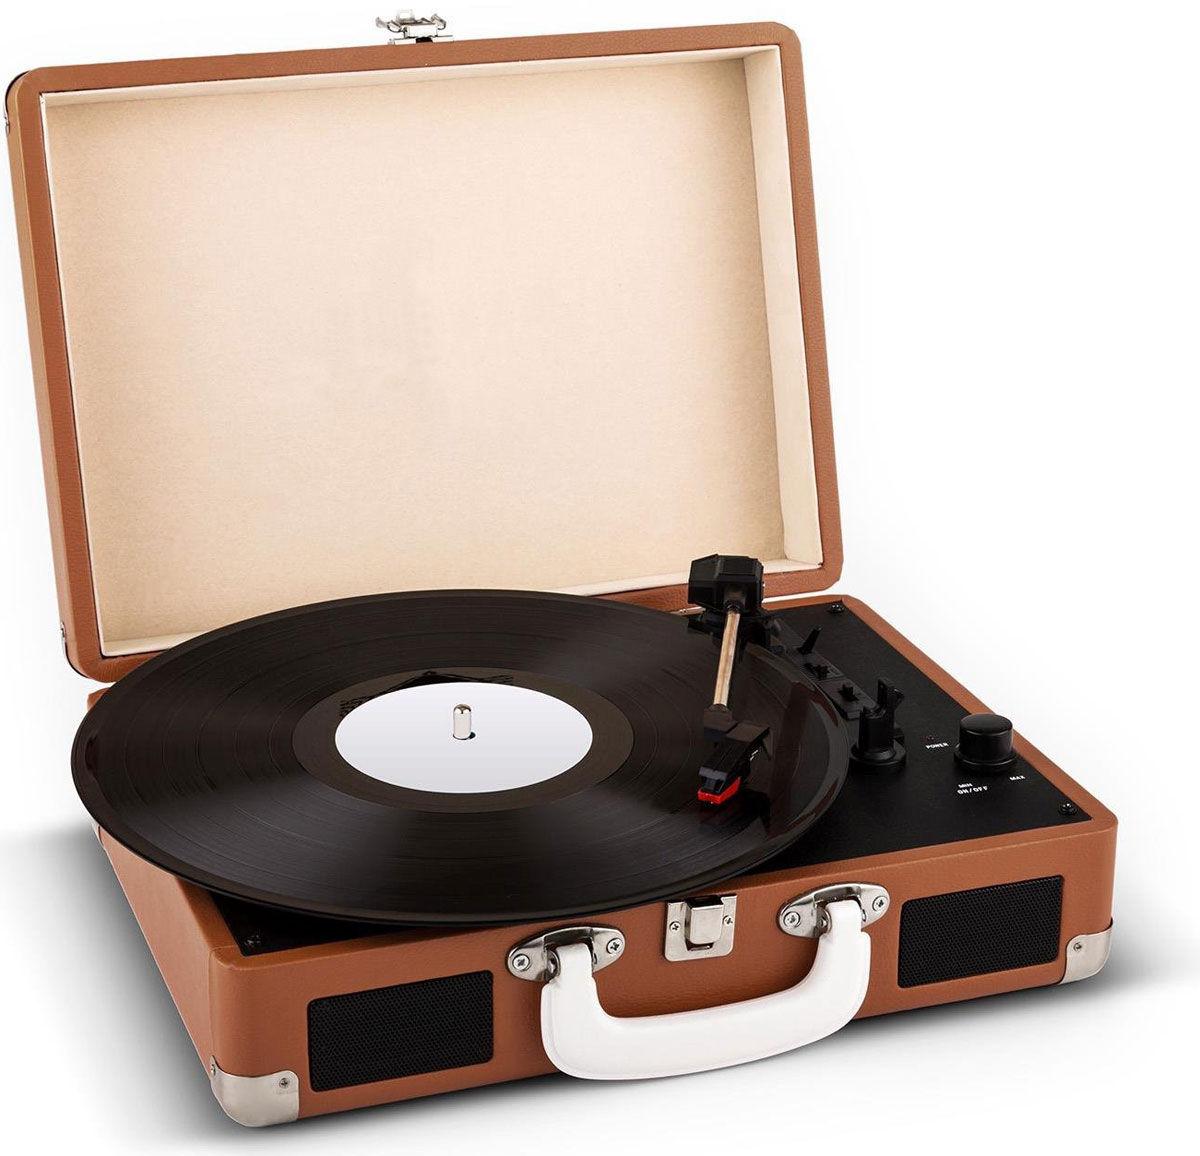 muse mt 101 platines vinyle usb son vid. Black Bedroom Furniture Sets. Home Design Ideas